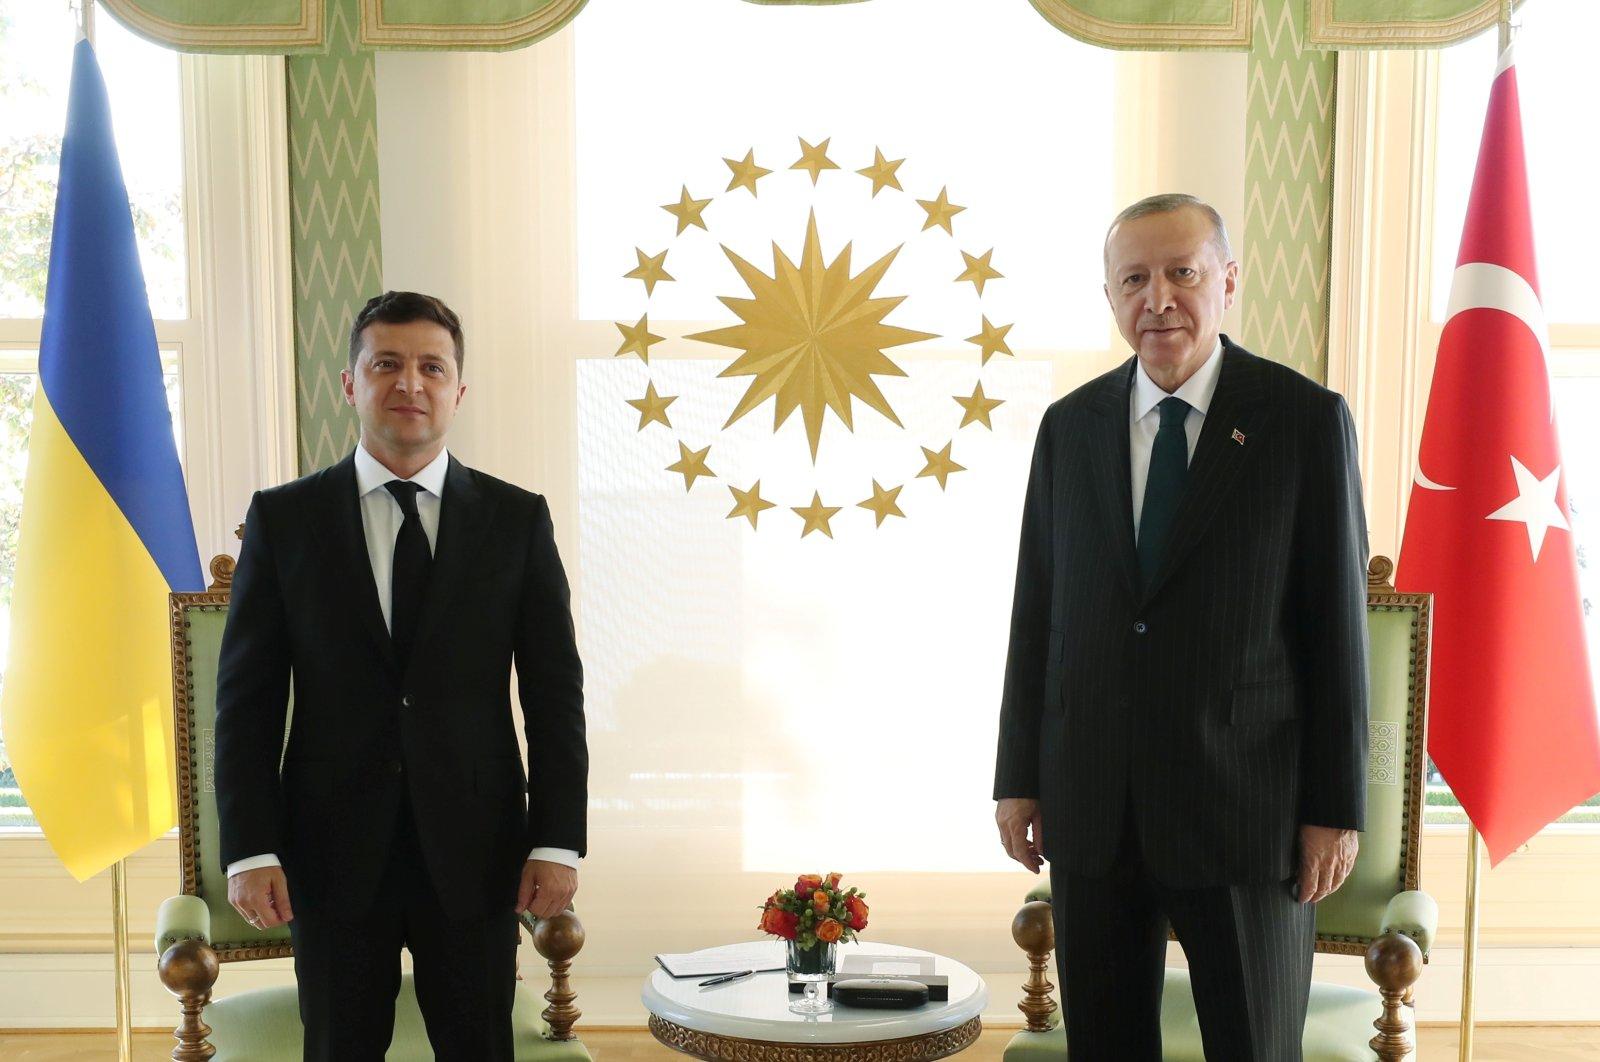 President Recep Tayyip Erdoğan meets with his Ukrainian counterpart Volodymyr Zelenskiy in Istanbul, Turkey, Oct. 16, 2020. (Reuters Photo)